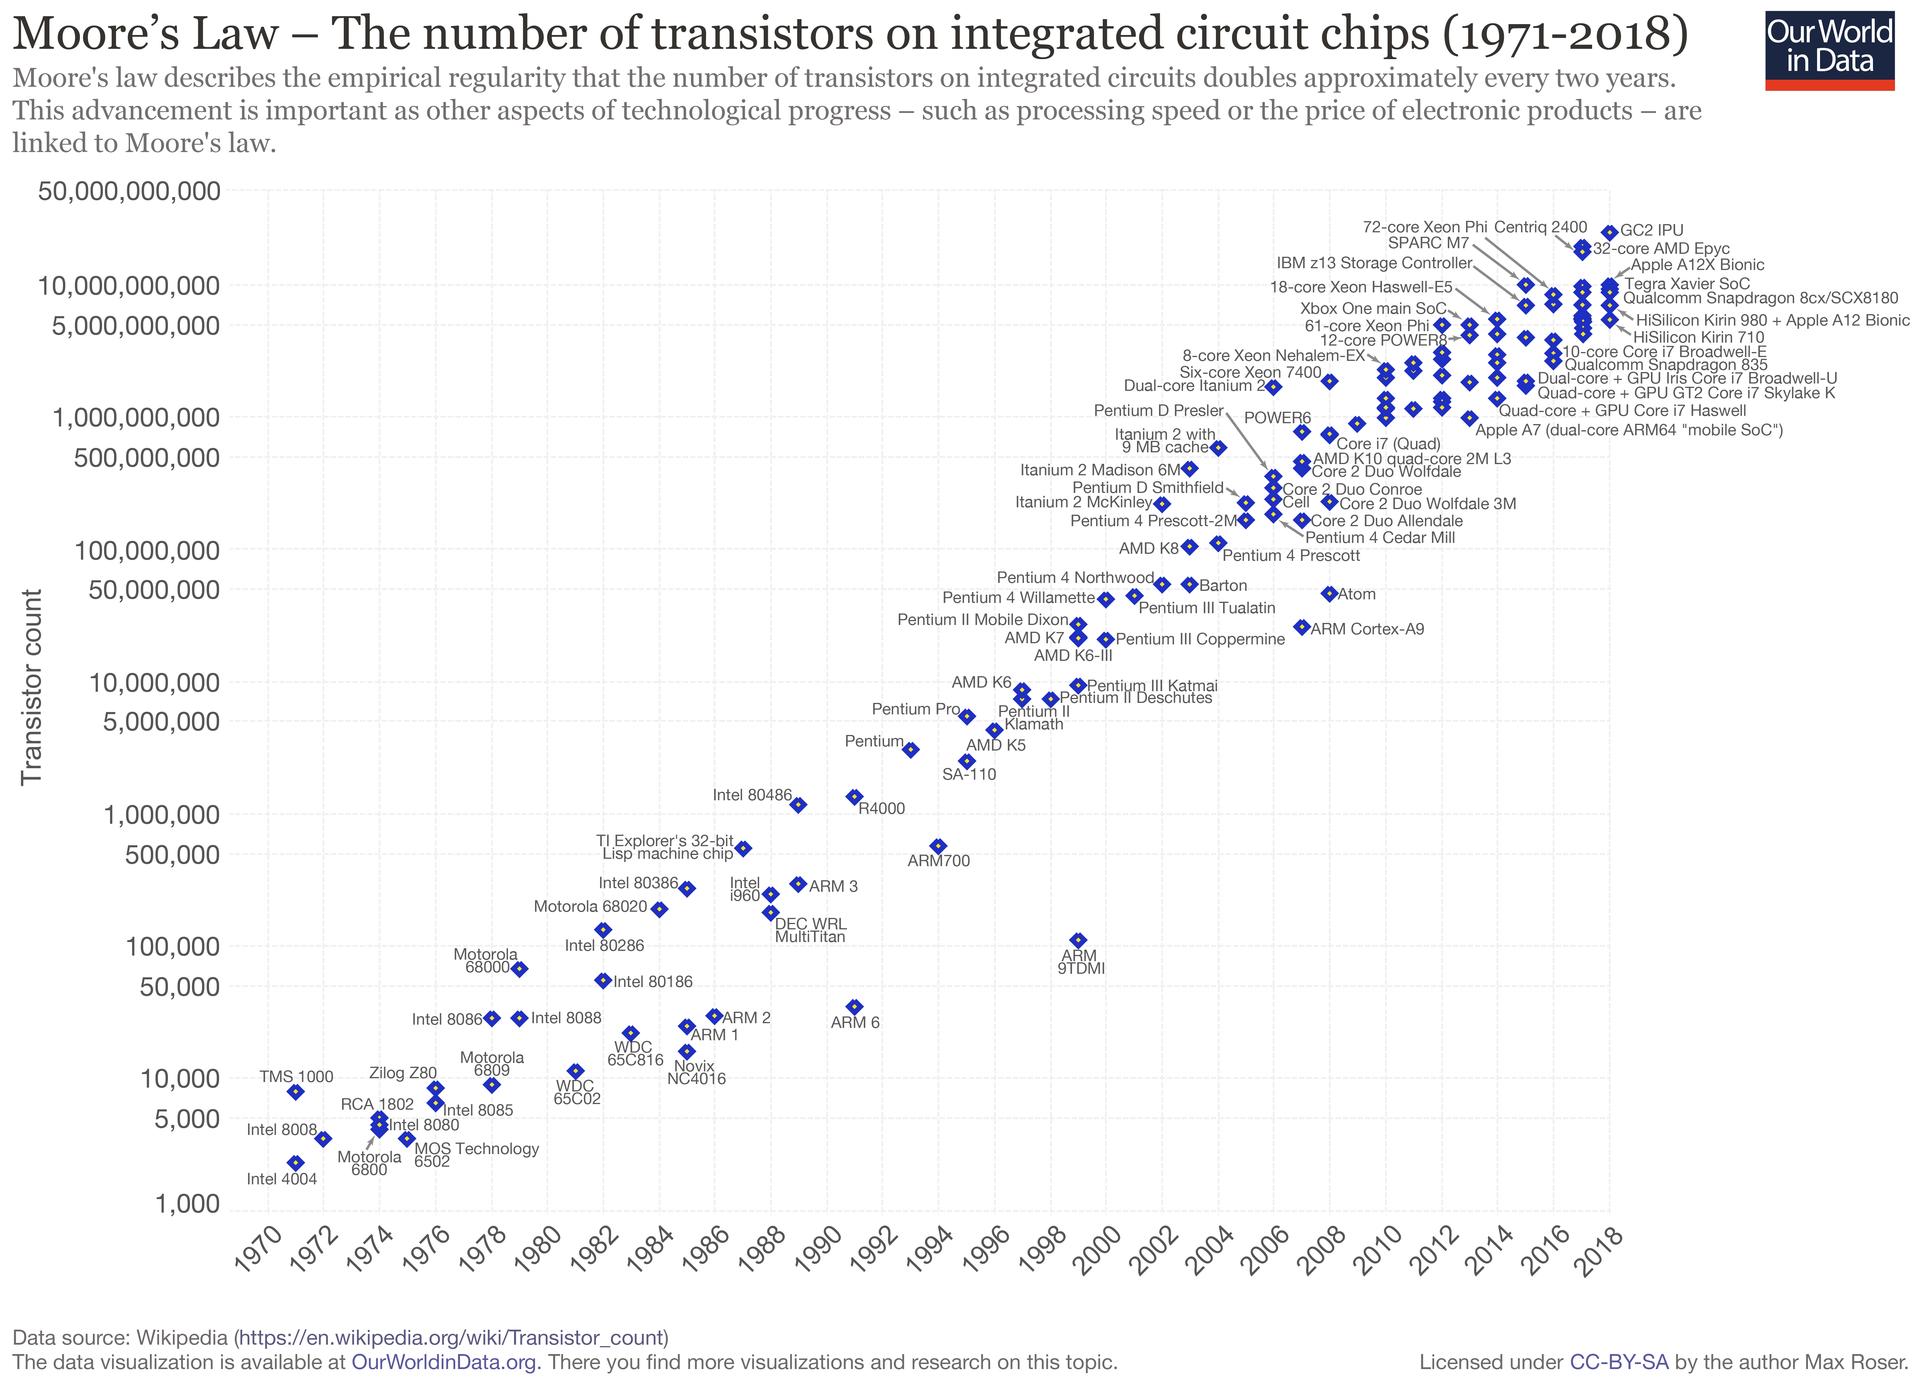 Grafik von Max Roser URL: https://ourworldindata.org/uploads/2019/05/Transistor-Count-over-time-to-2018.png (CC BY SA)